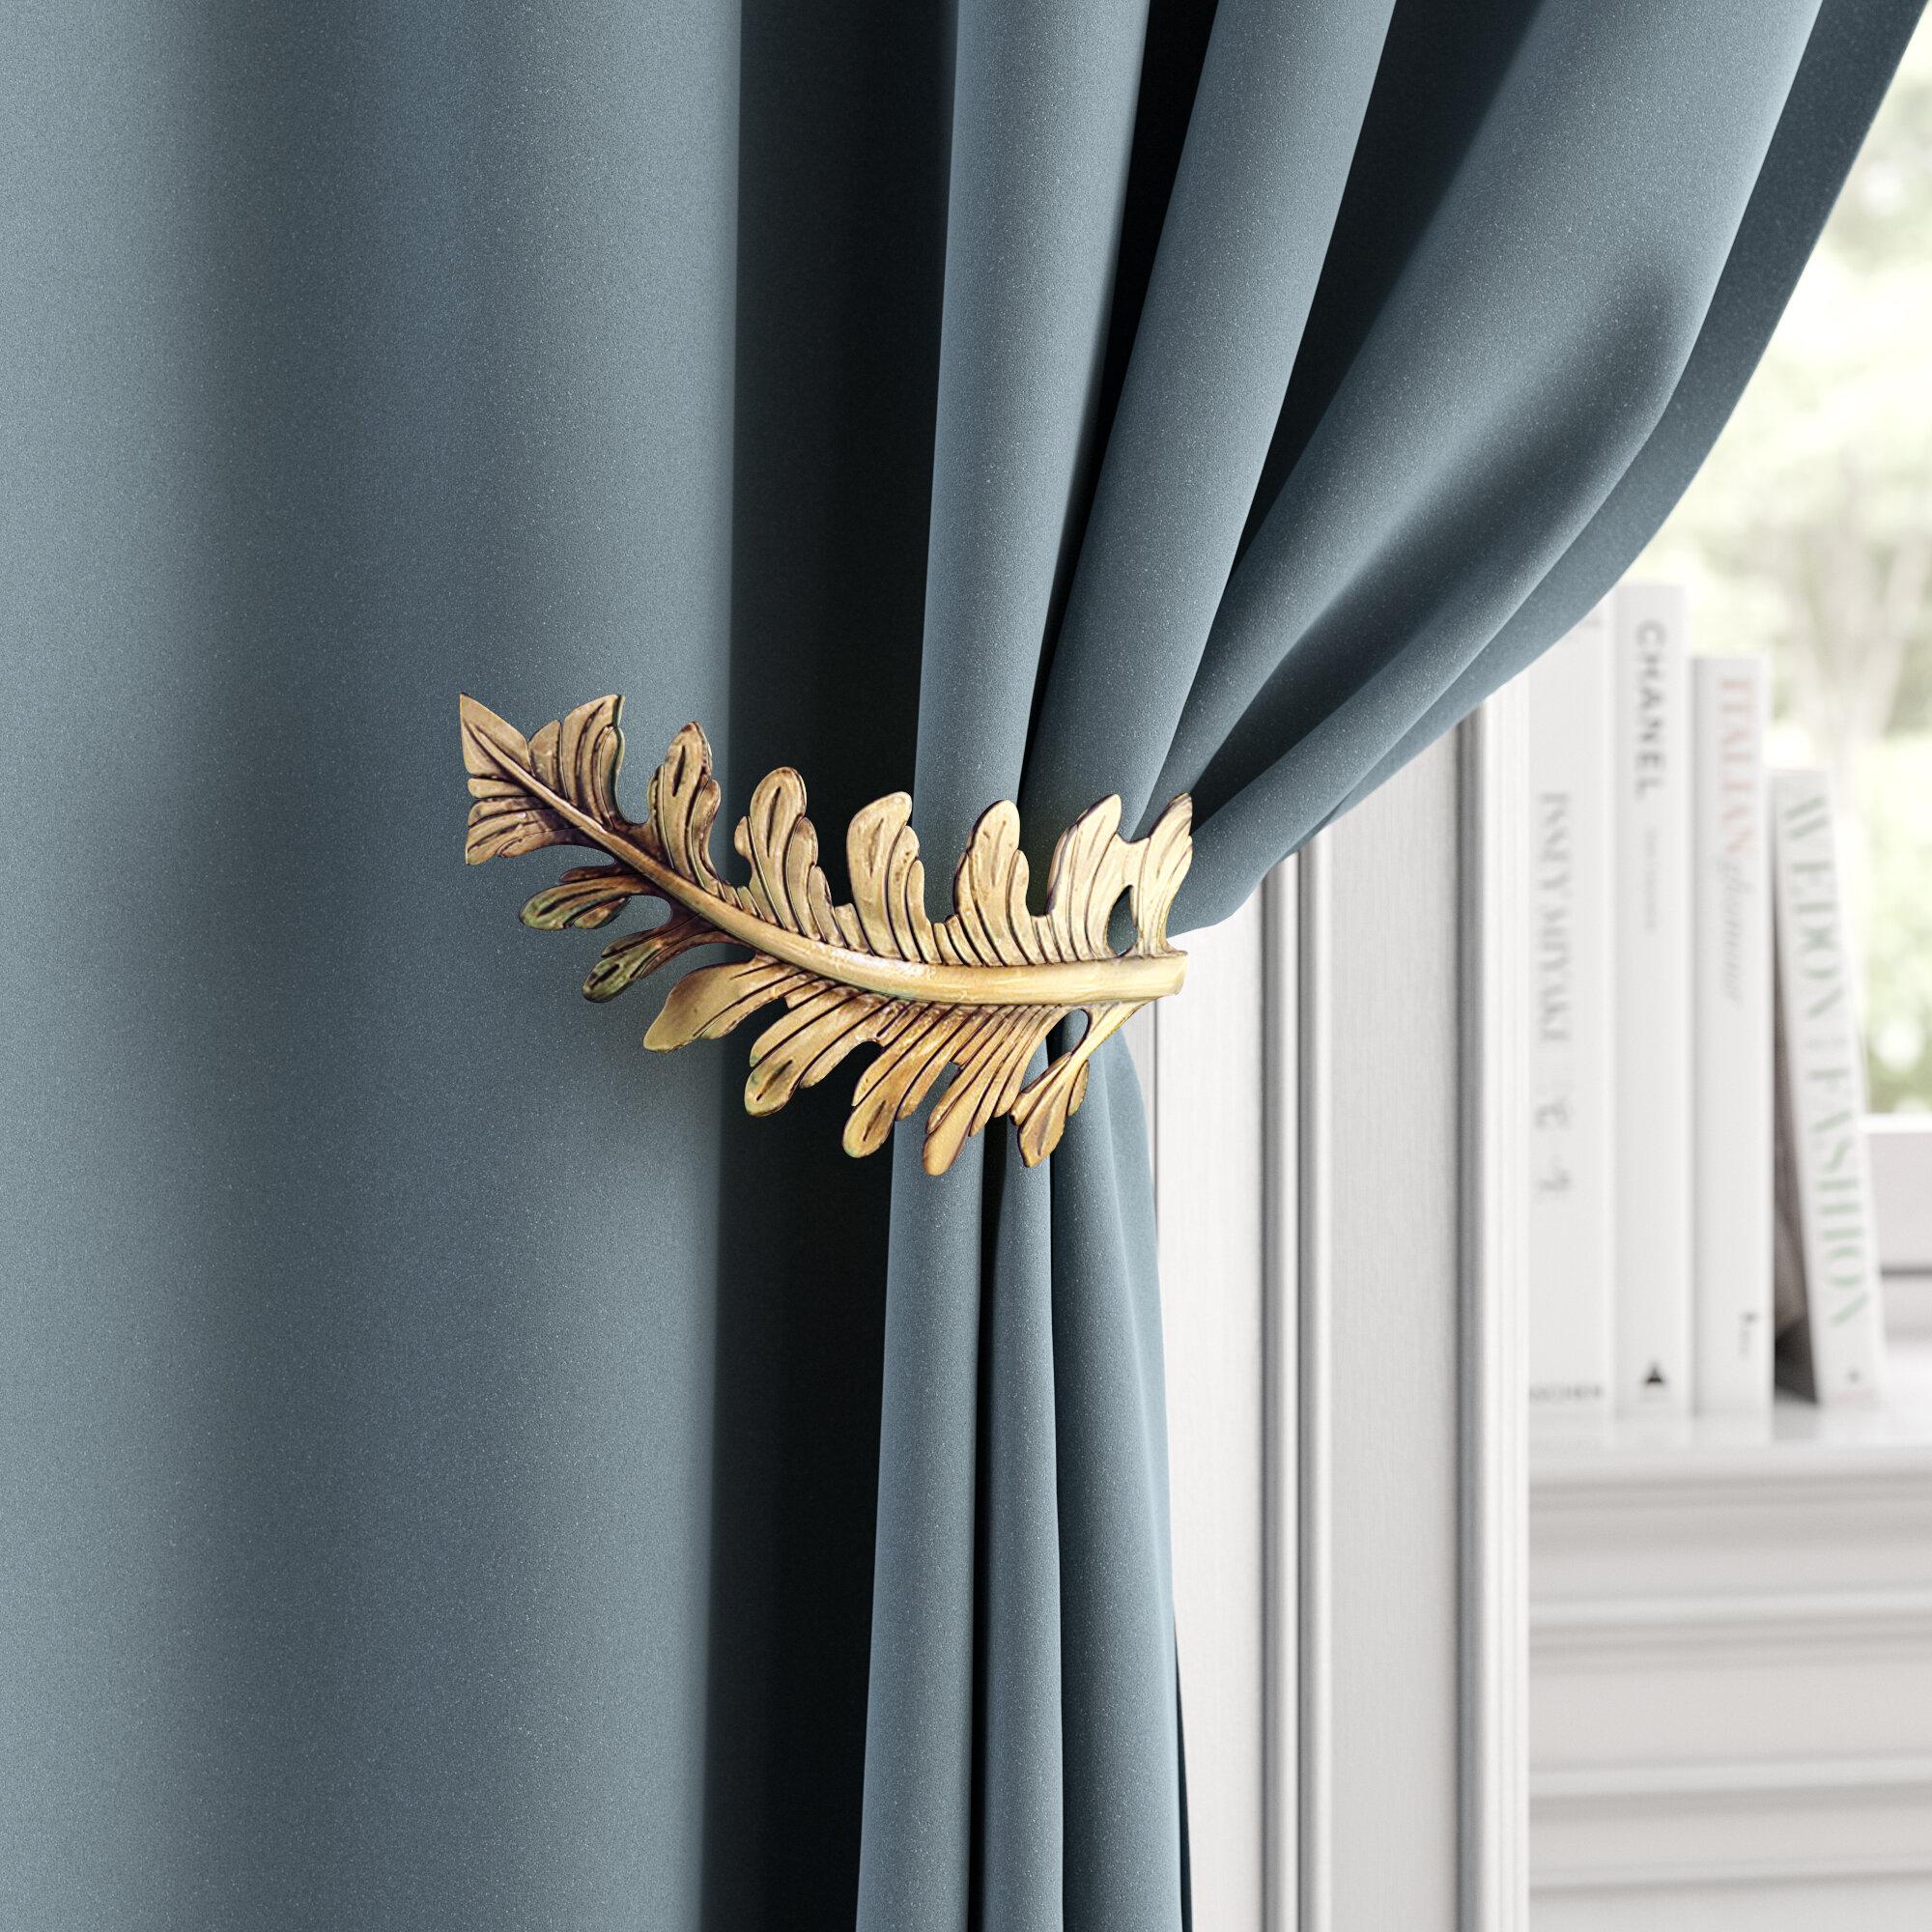 /… Beige, 2 Pack YOLIFE Strong Magnetic Curtain Tiebacks 16 inch Durable Curtain Holdbacks Modern Designed Tie Backs for Curtain Drape Holder Braided Rope Holdback